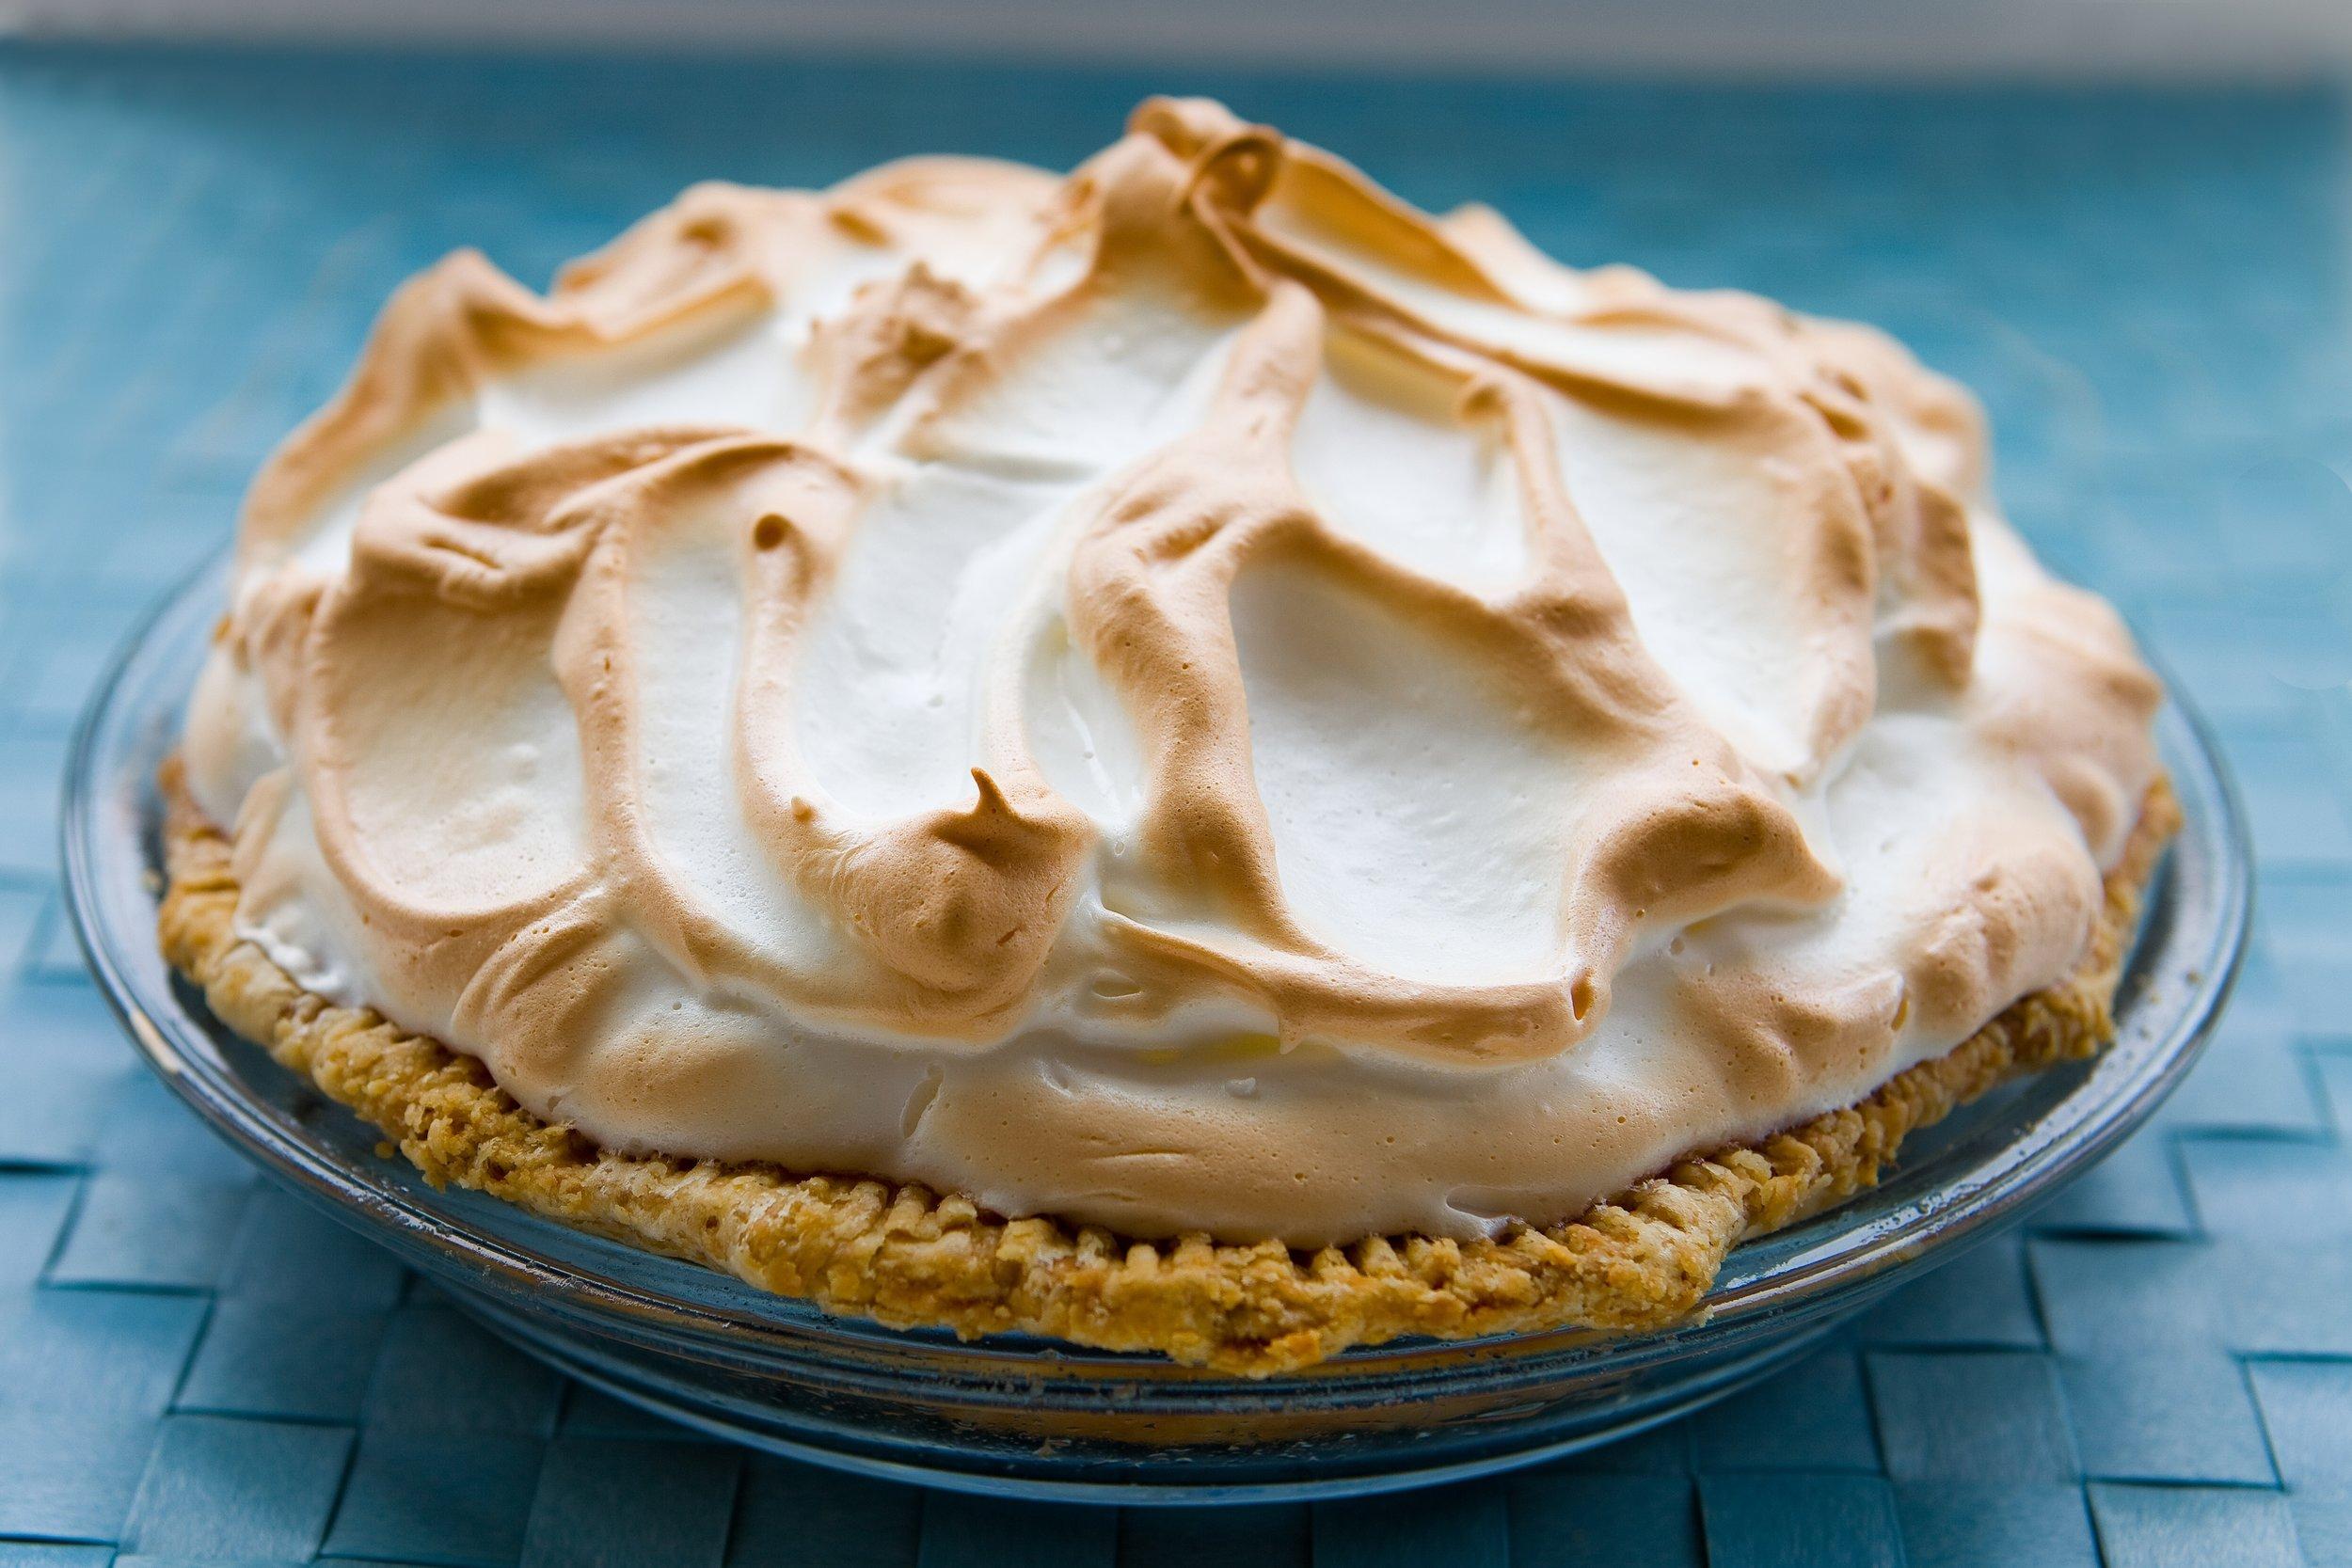 Lemon meringue pie original.jpg